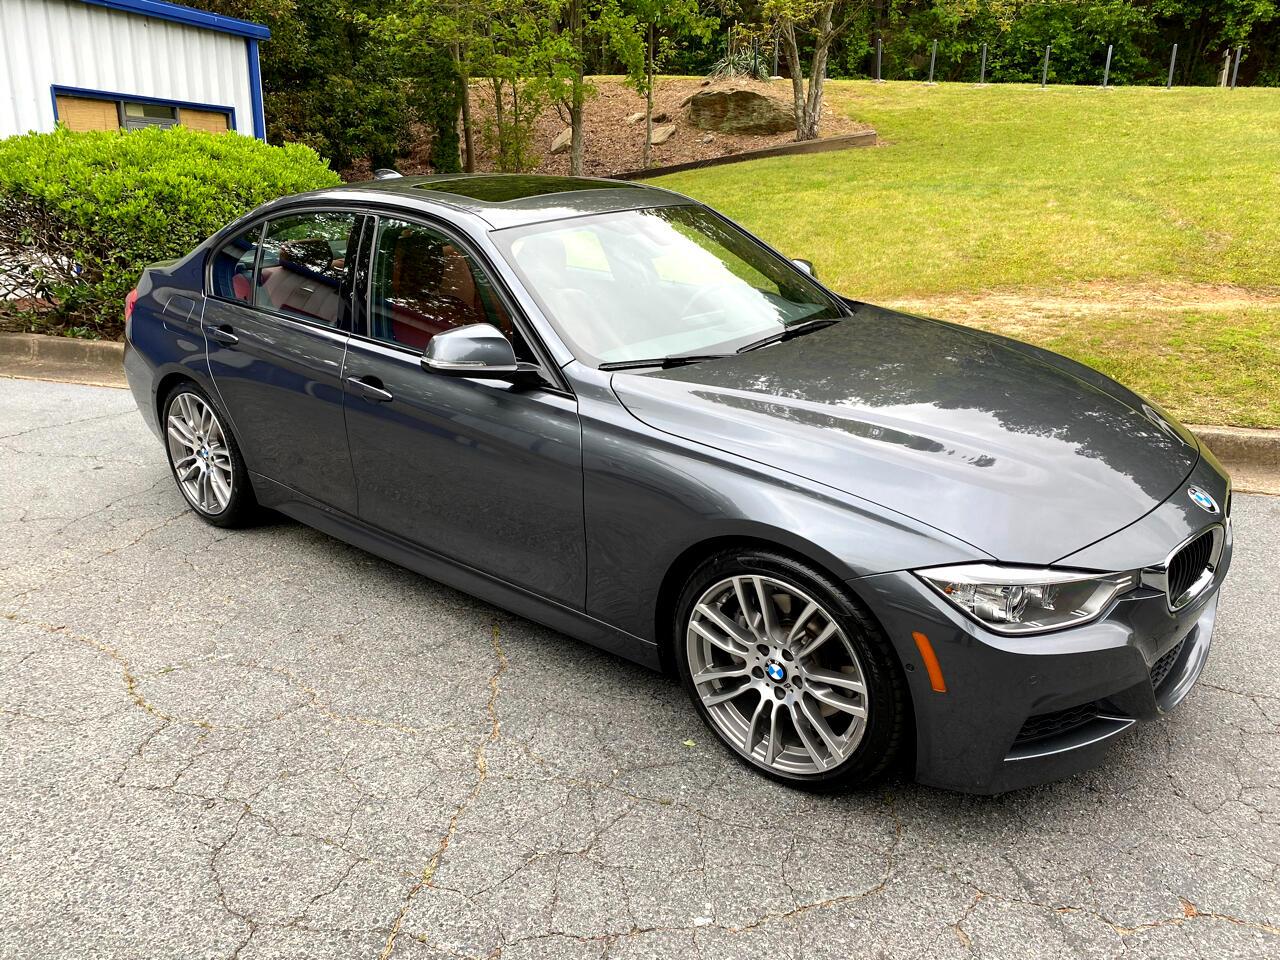 BMW 3 Series 4dr Sdn 335i RWD 2013